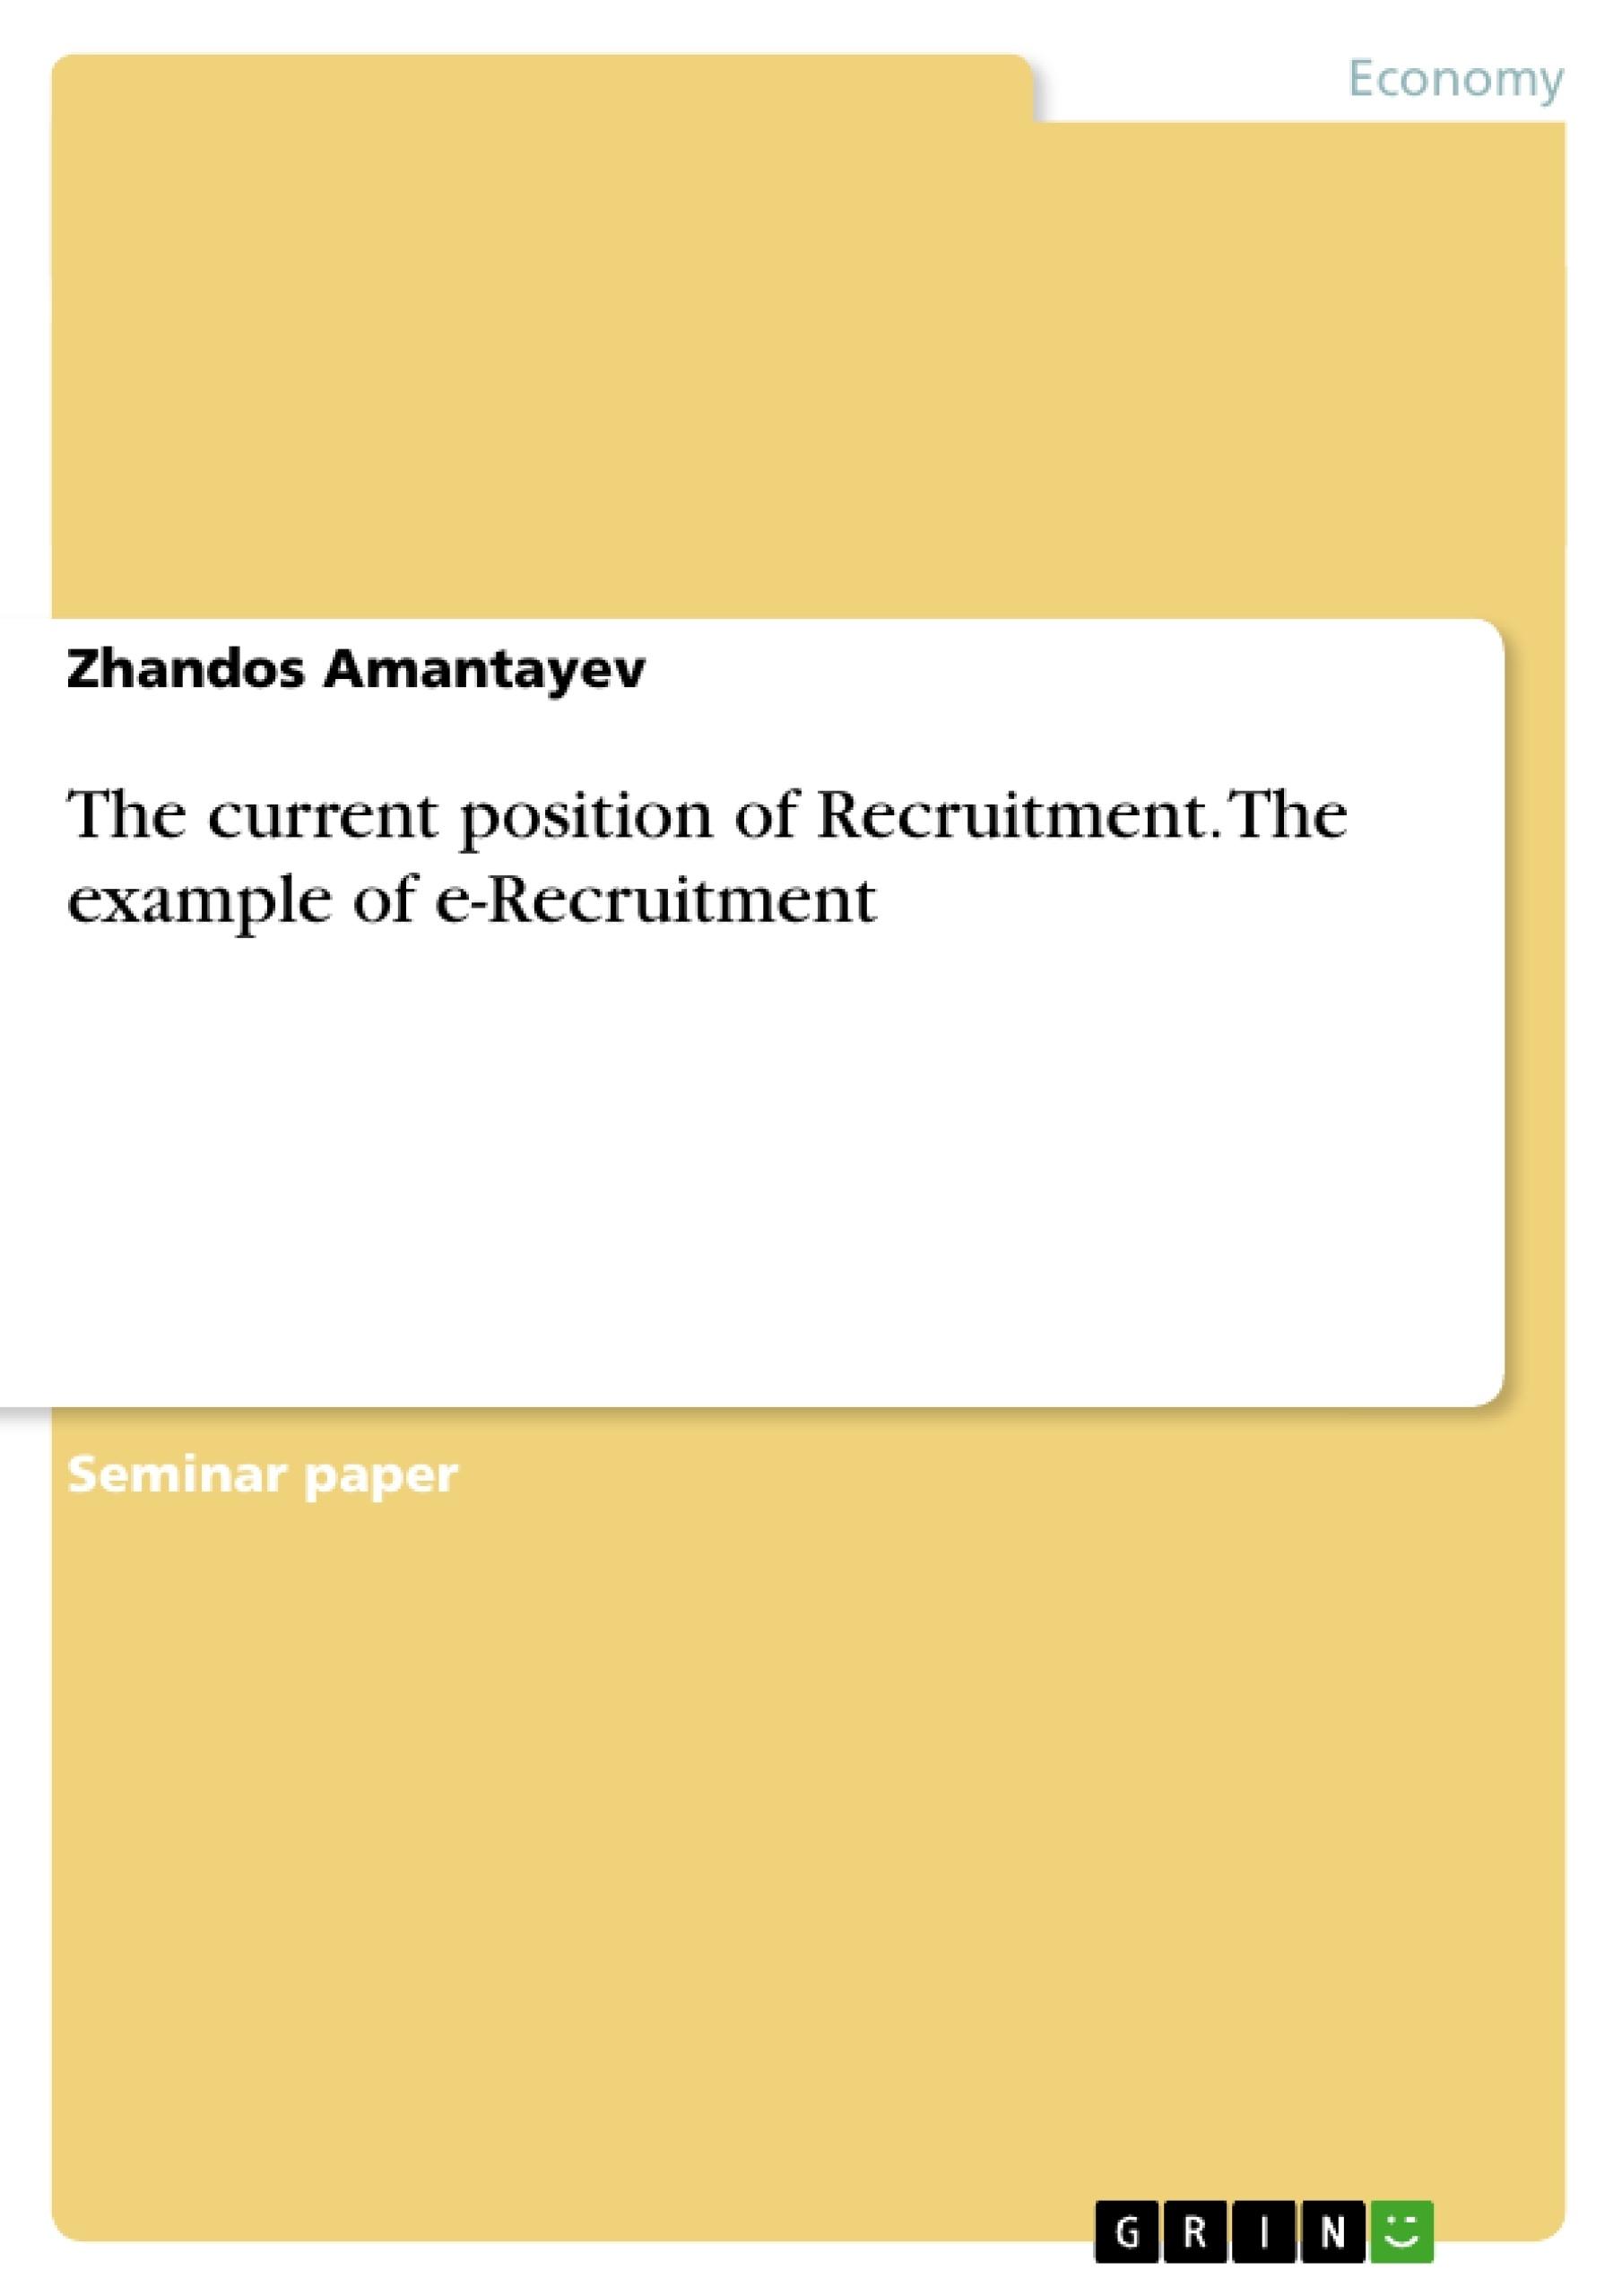 Master thesis recruitment